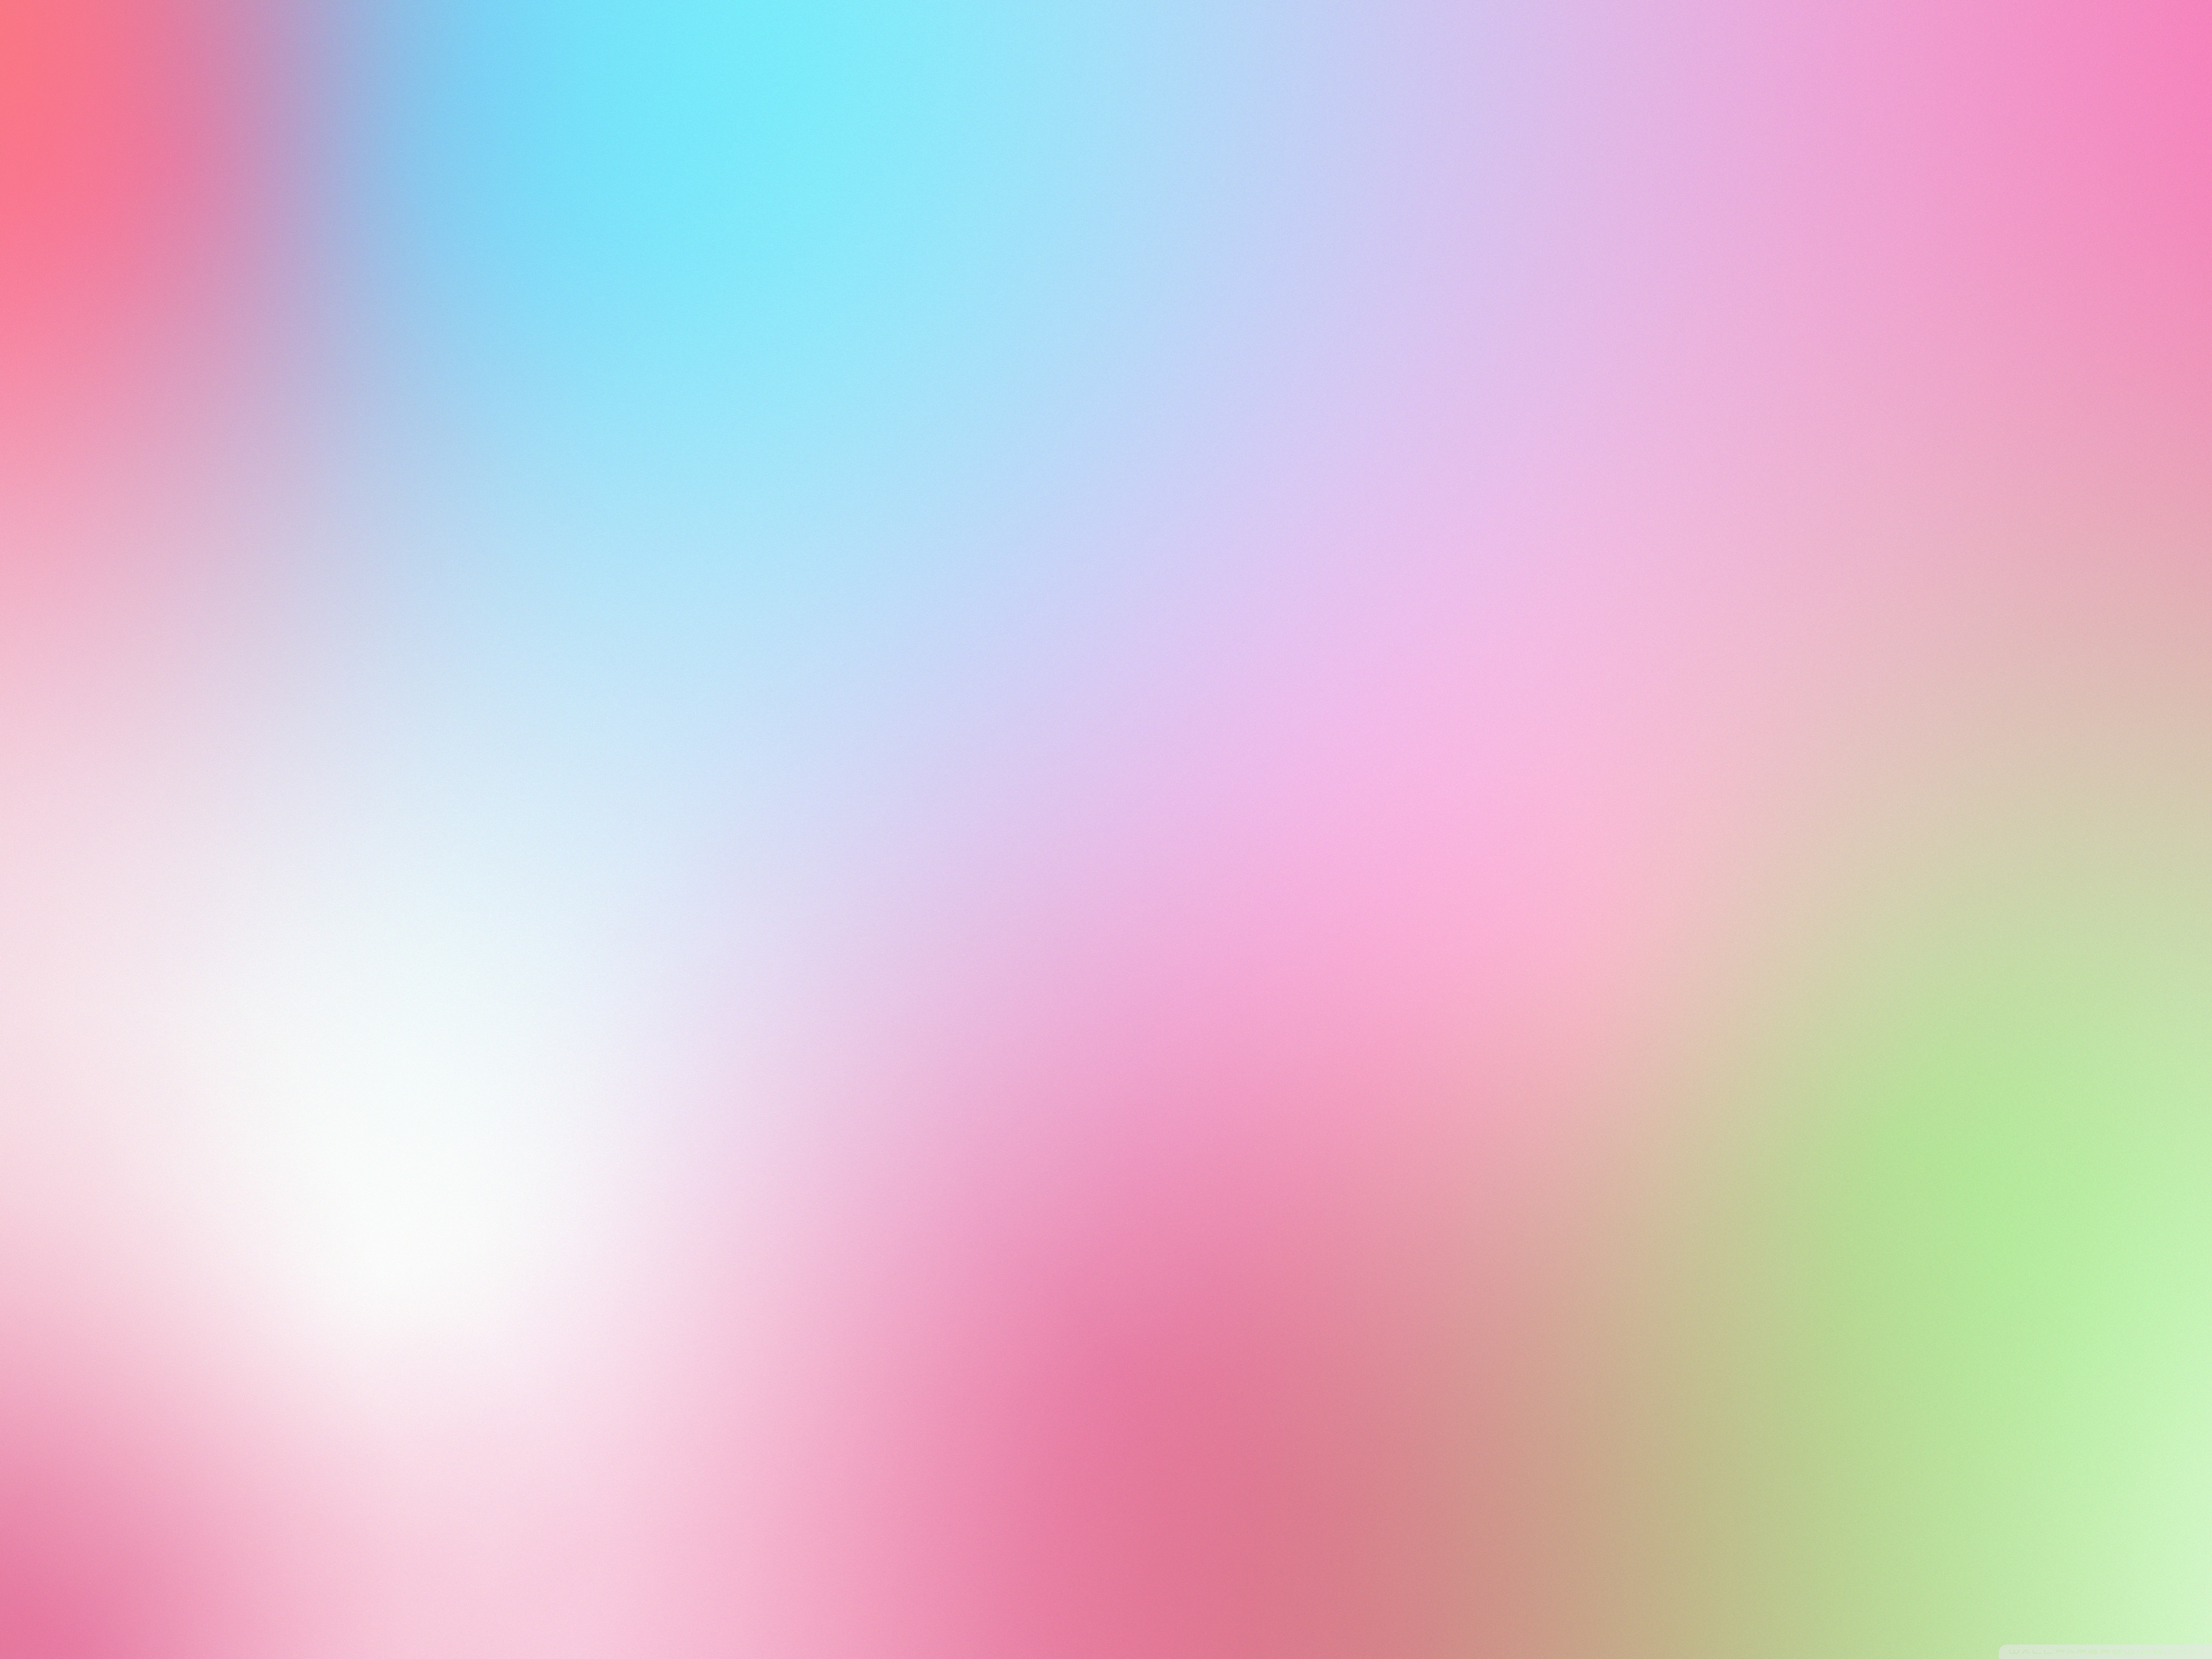 Wallpaper Blurry colors